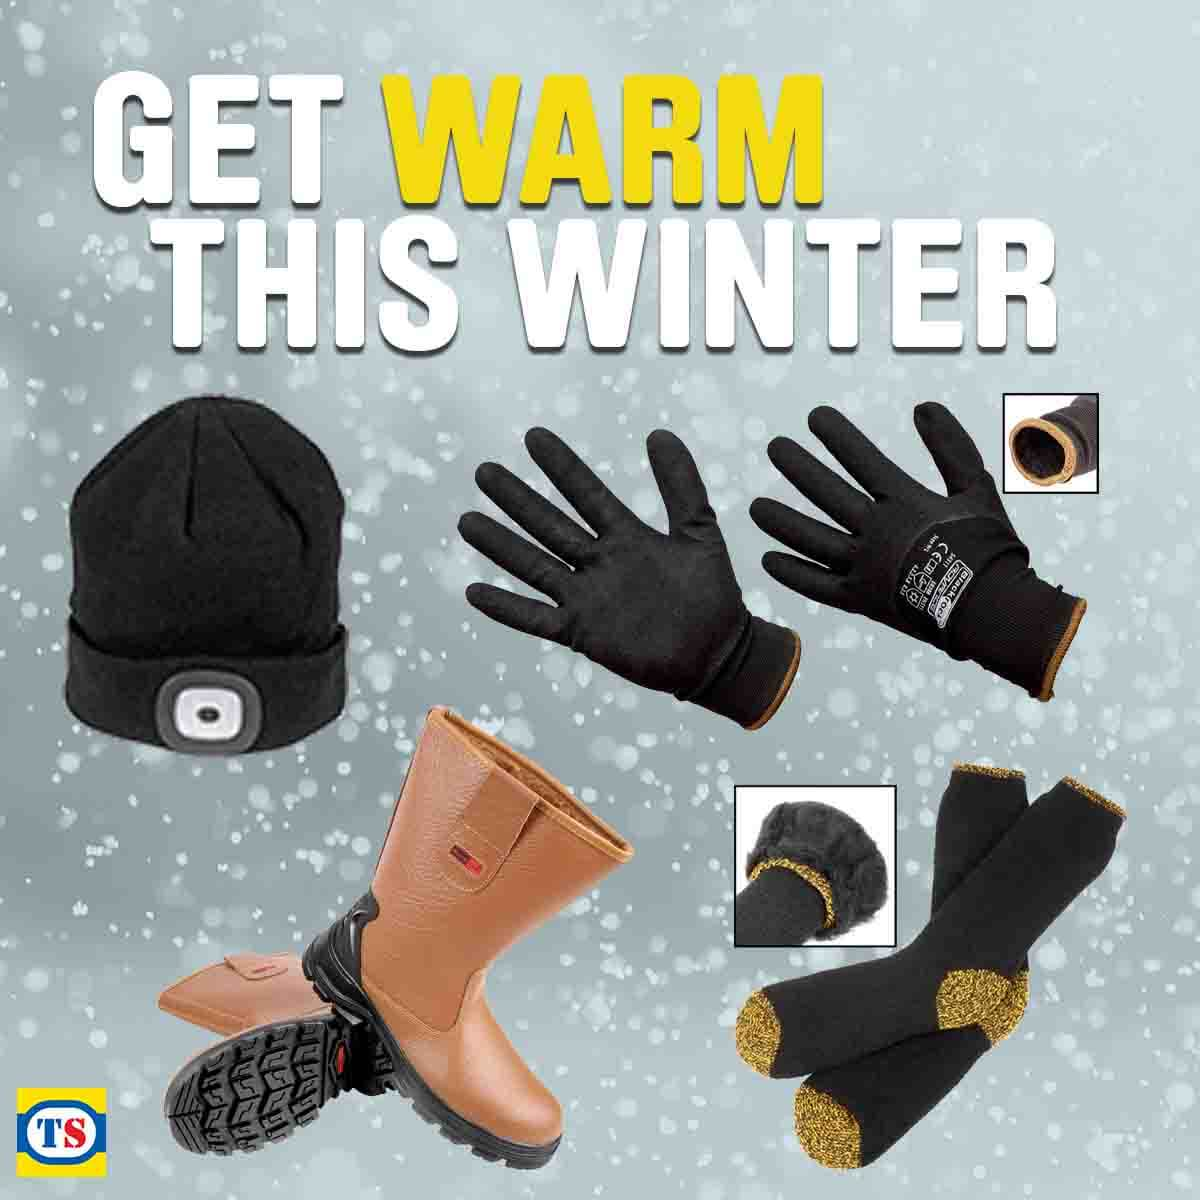 Get Warm This Winter